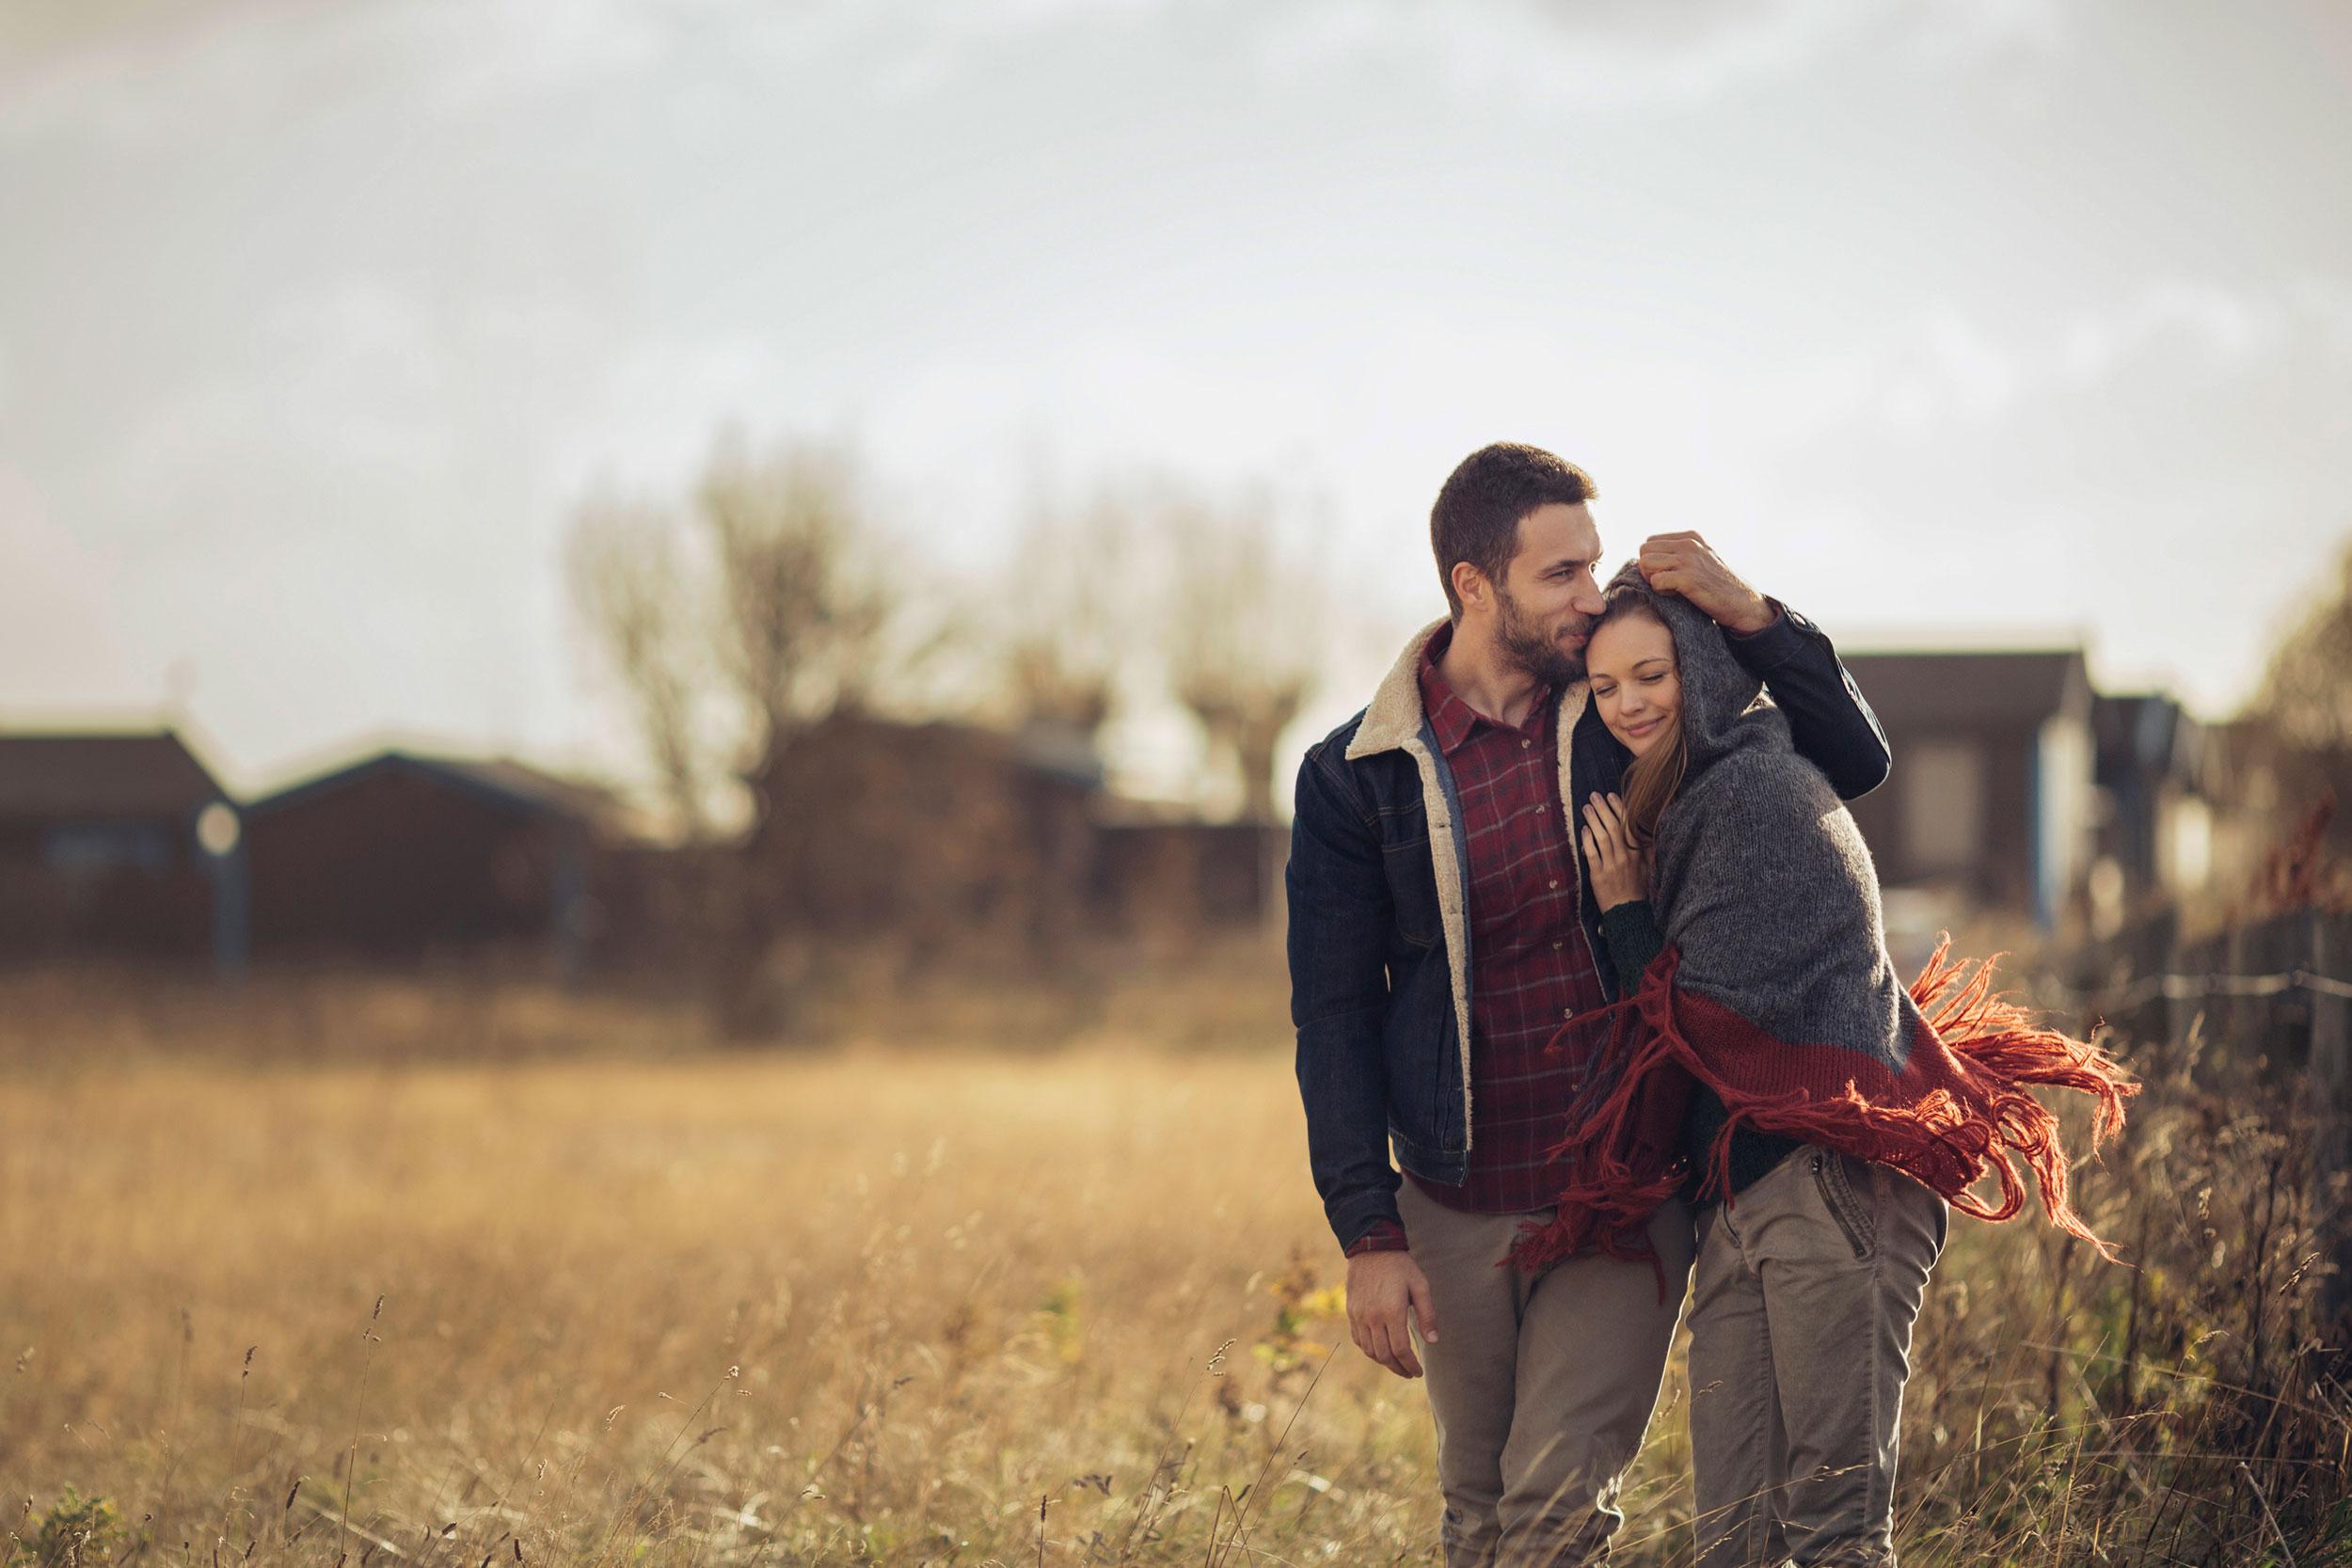 Cara Agar Tidak Kehilangan Jati Diri saat Jatuh Cinta